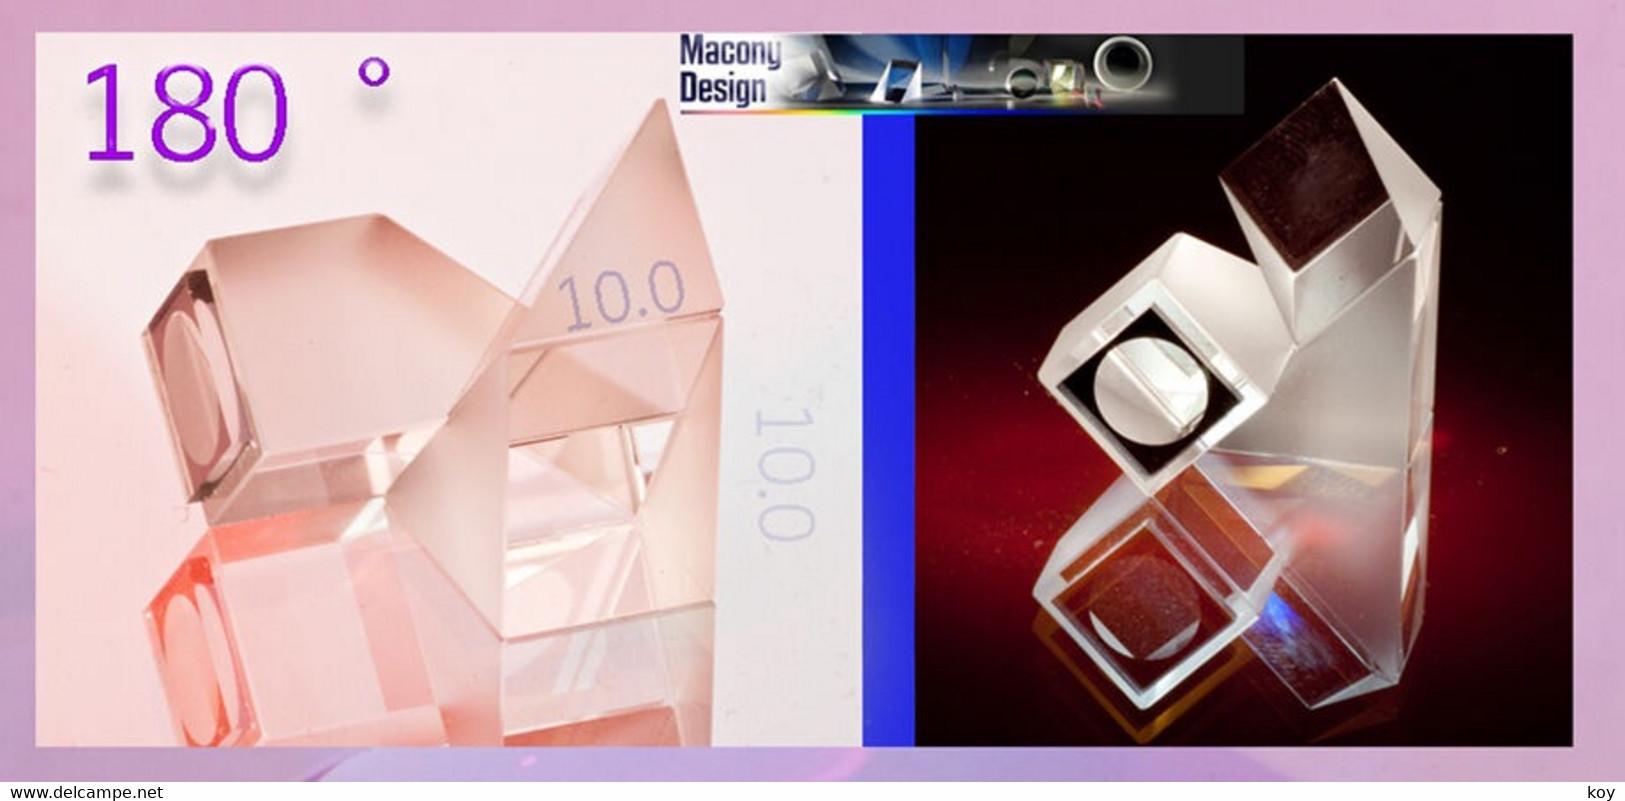 PRÄZISIONS - 180 °_UMKEHR - PRISMA   10  X 10  MM_ HQO = HIGH QUALITY OPTICS * * * HQUP10 - Prismas